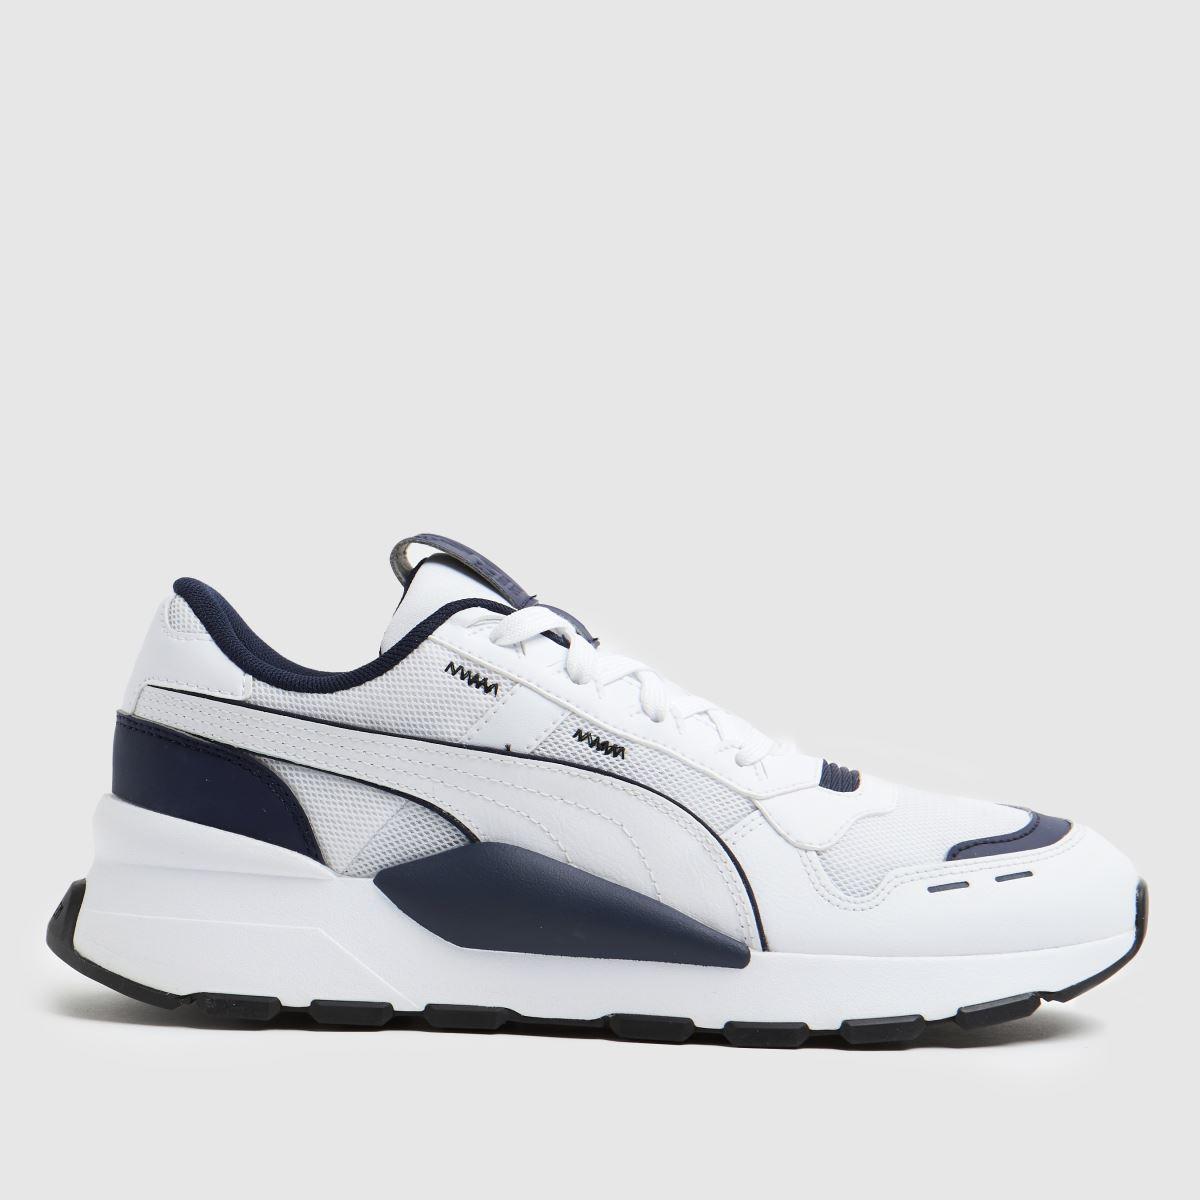 PUMA White Rs 2.0 Trainers